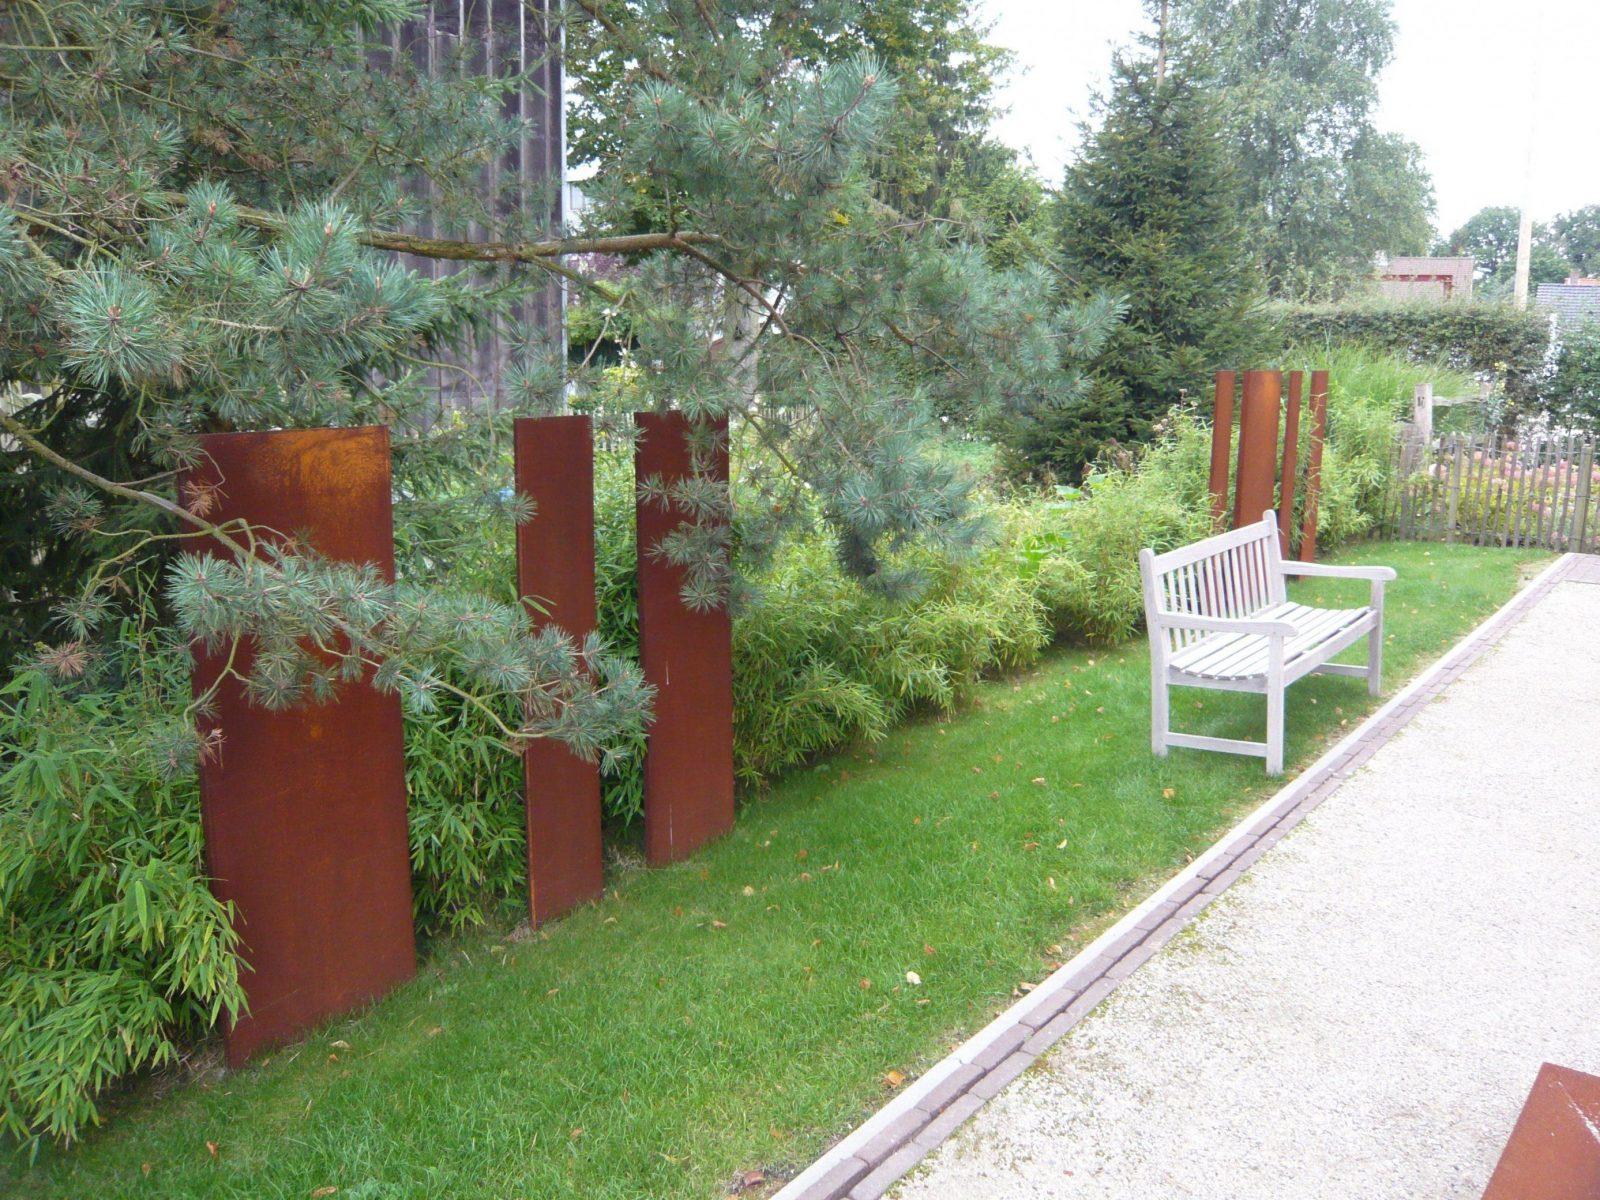 Schutting Cortenstaal  Planters  Pinterest  Sichtschutz Garten von Cortenstahl Sichtschutz Für Garten Photo